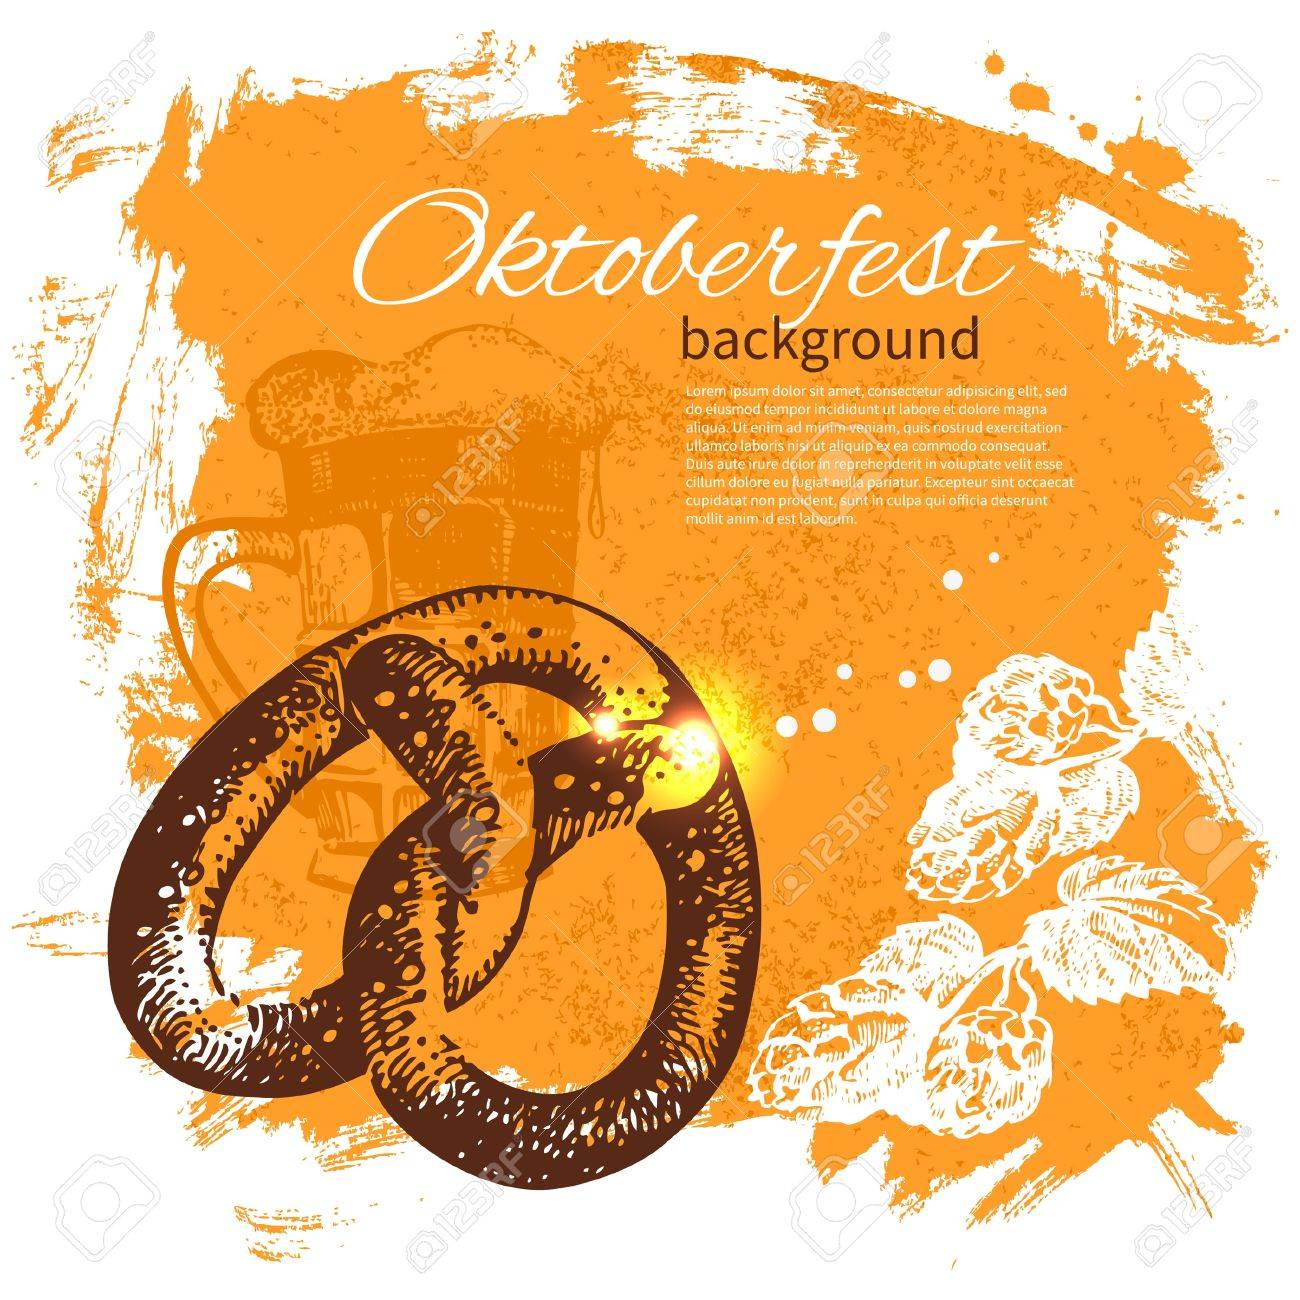 Oktoberfest vintage background. Hand drawn illustration. Splash blob retro design with beer Stock Vector - 20027929